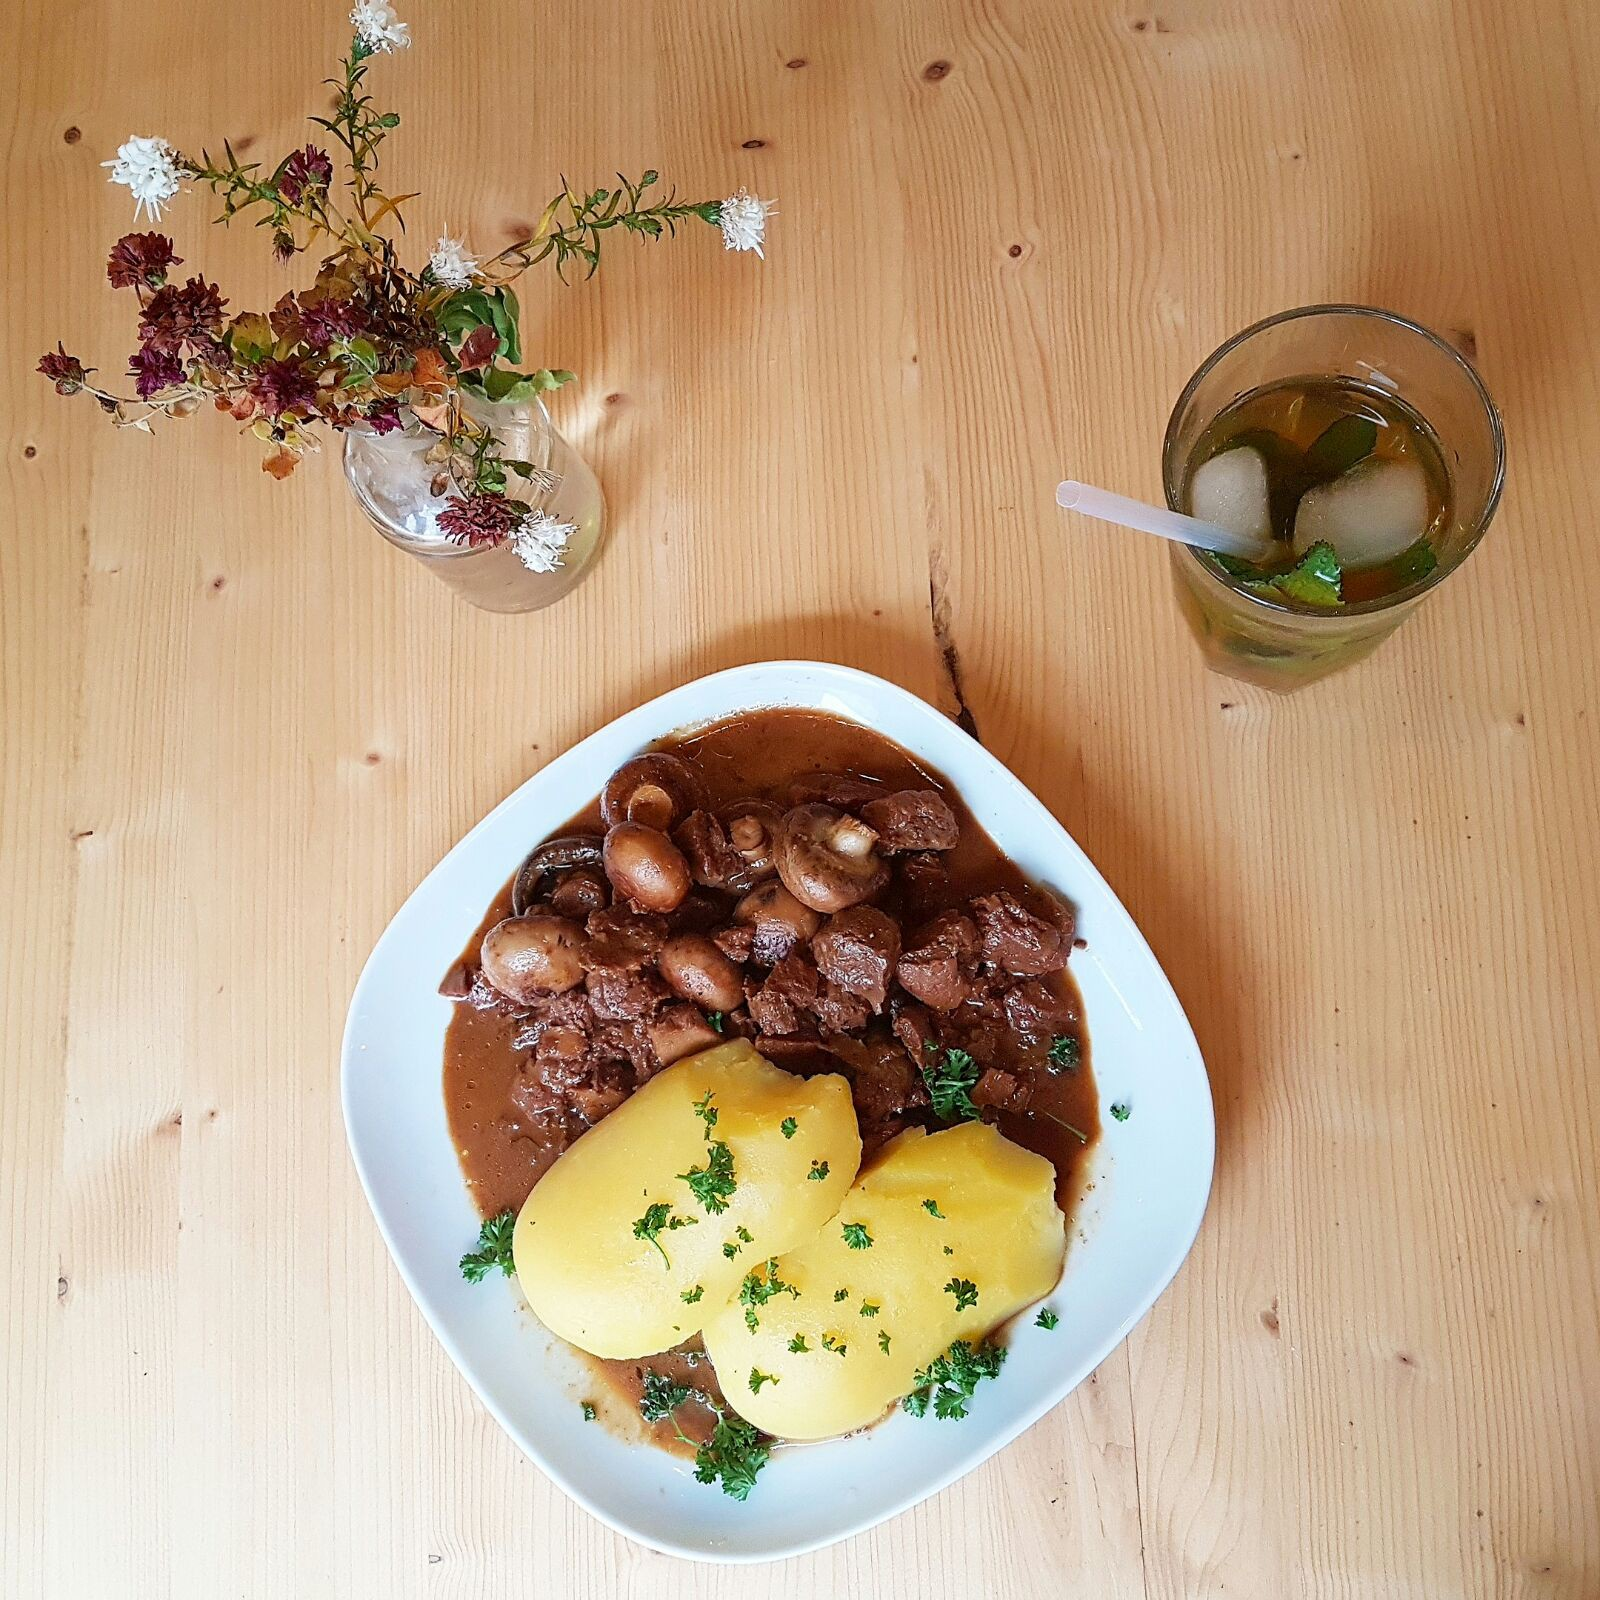 Restaurant Salute Salate in Mainz